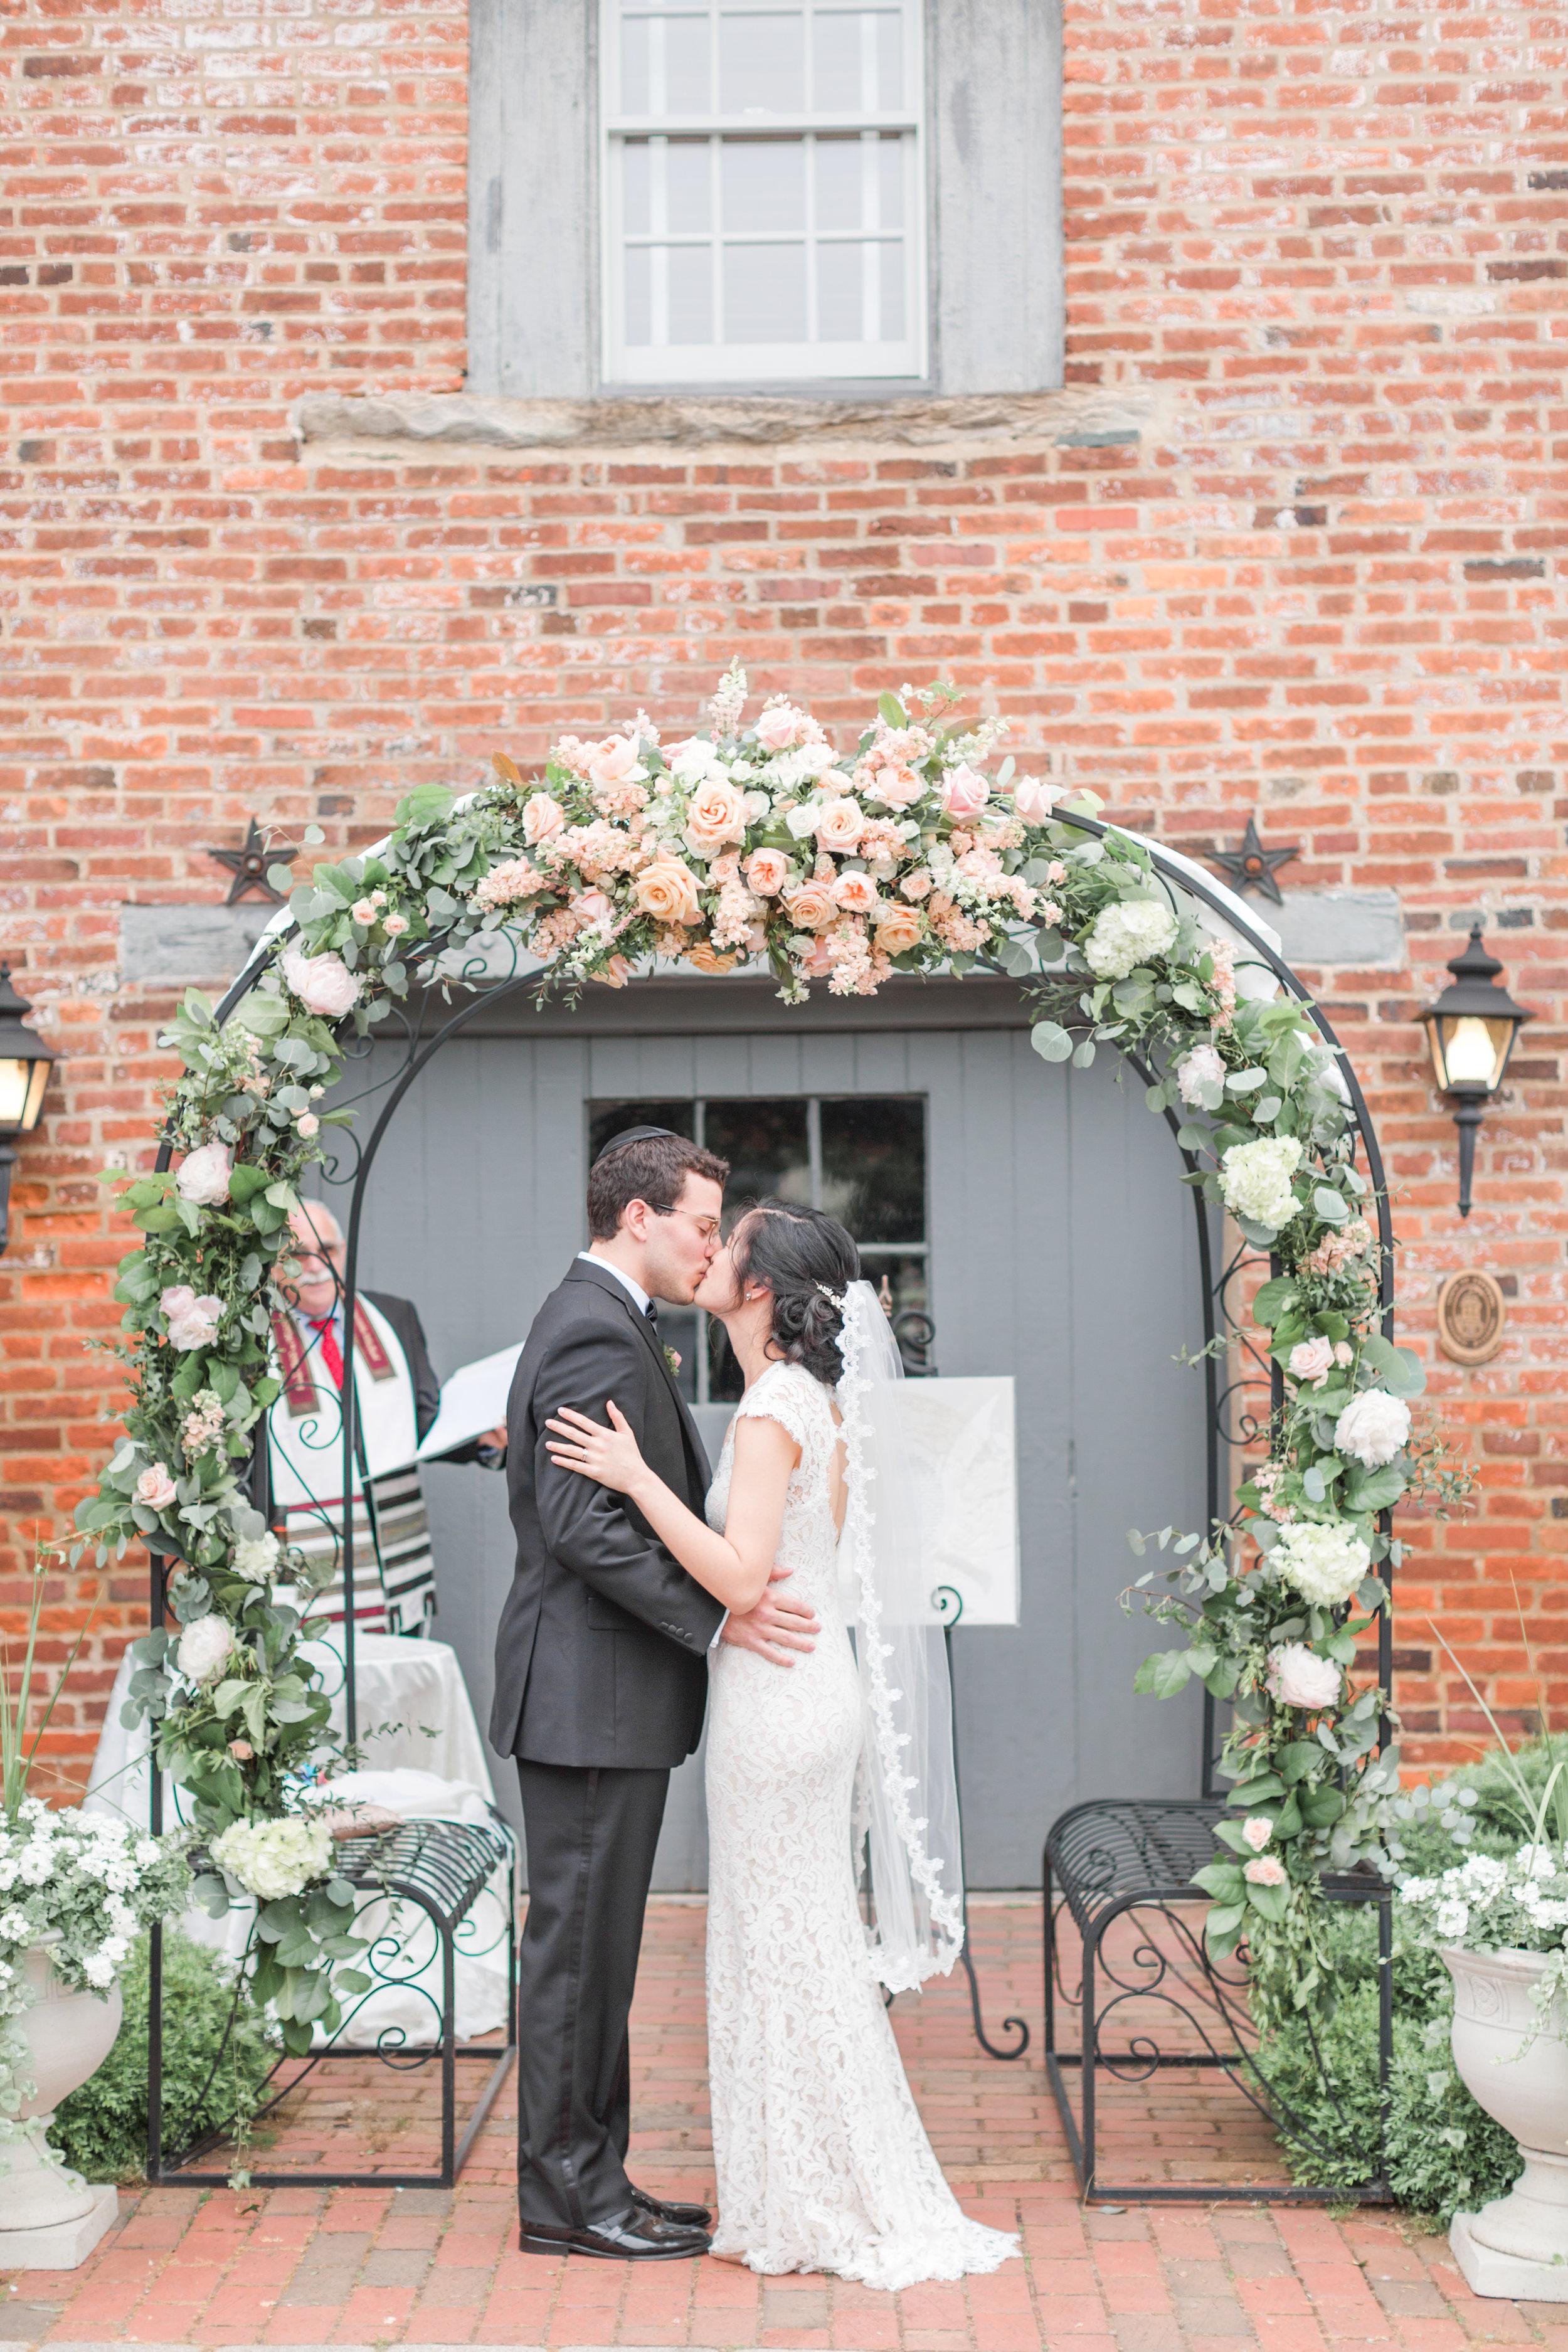 Leesburg-Wedding-Photos_Thomas-Birkby-House-Wedding_Jessica-Green-Photography-101.jpg